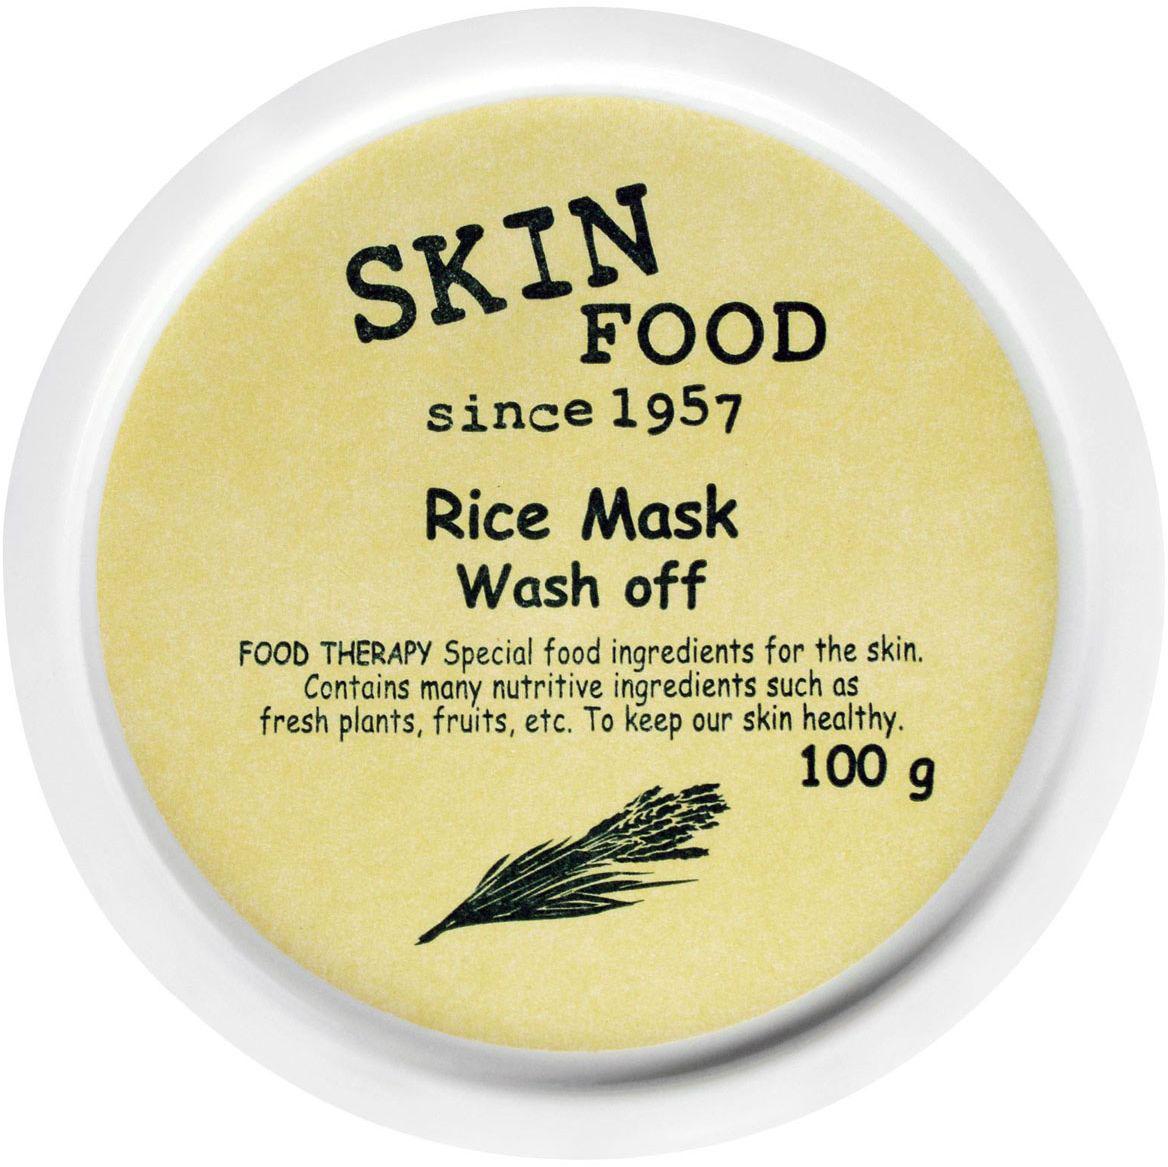 Skinfood Rice Рисовая очищающая маска, 100 гр skinfood rice маска смываемая для лица rice маска смываемая для лица